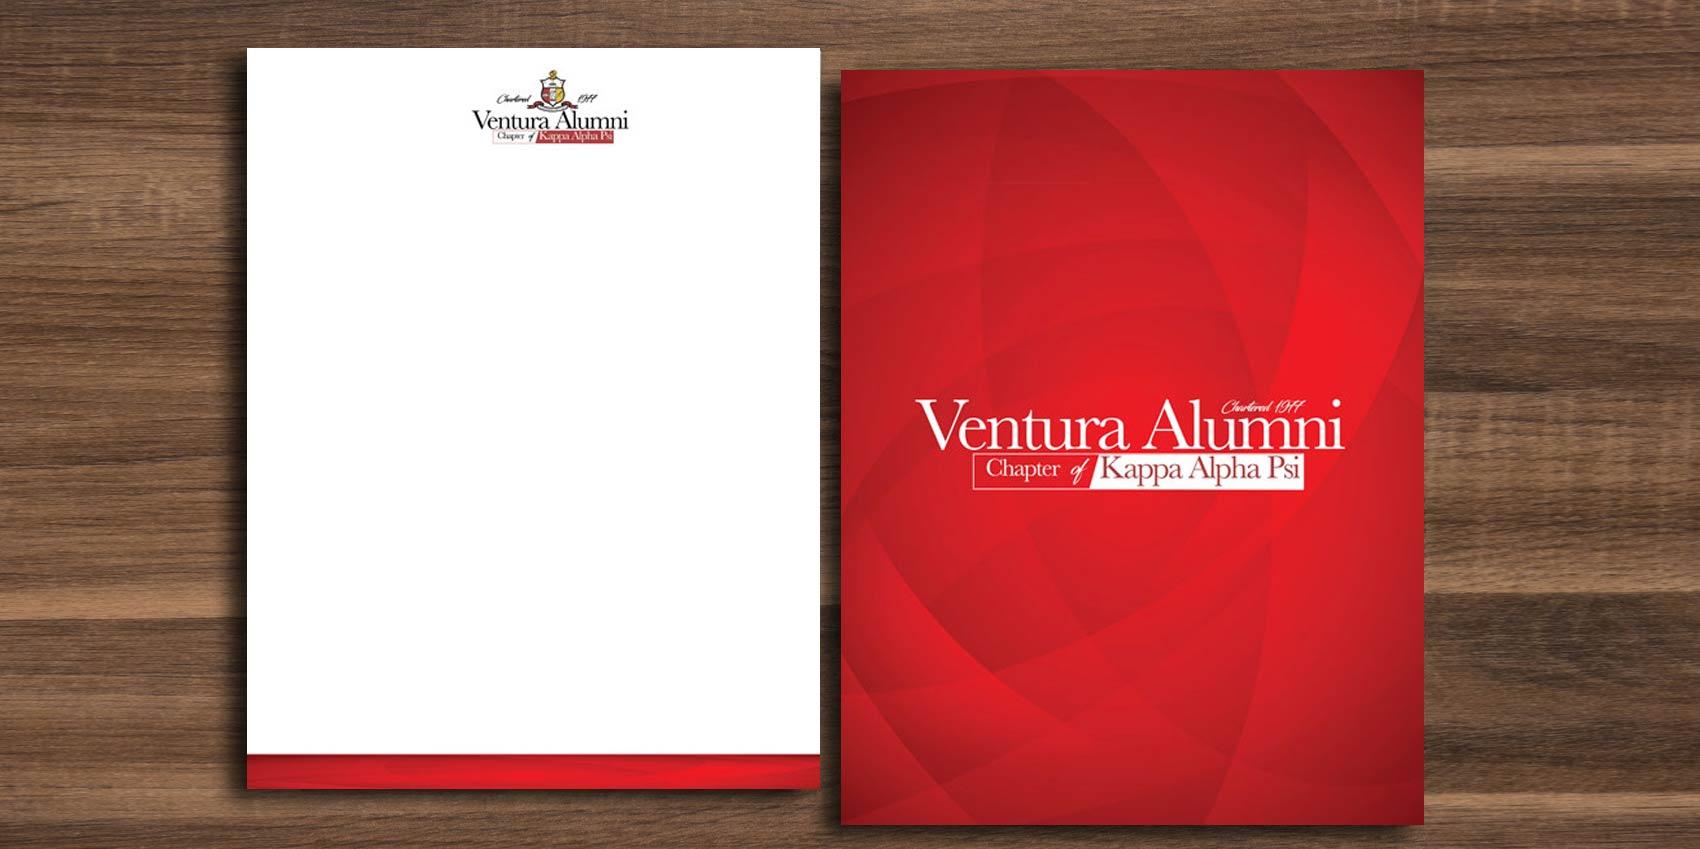 Letterhead Design for the ventura alumni chapter of kappa alpha psi stationary